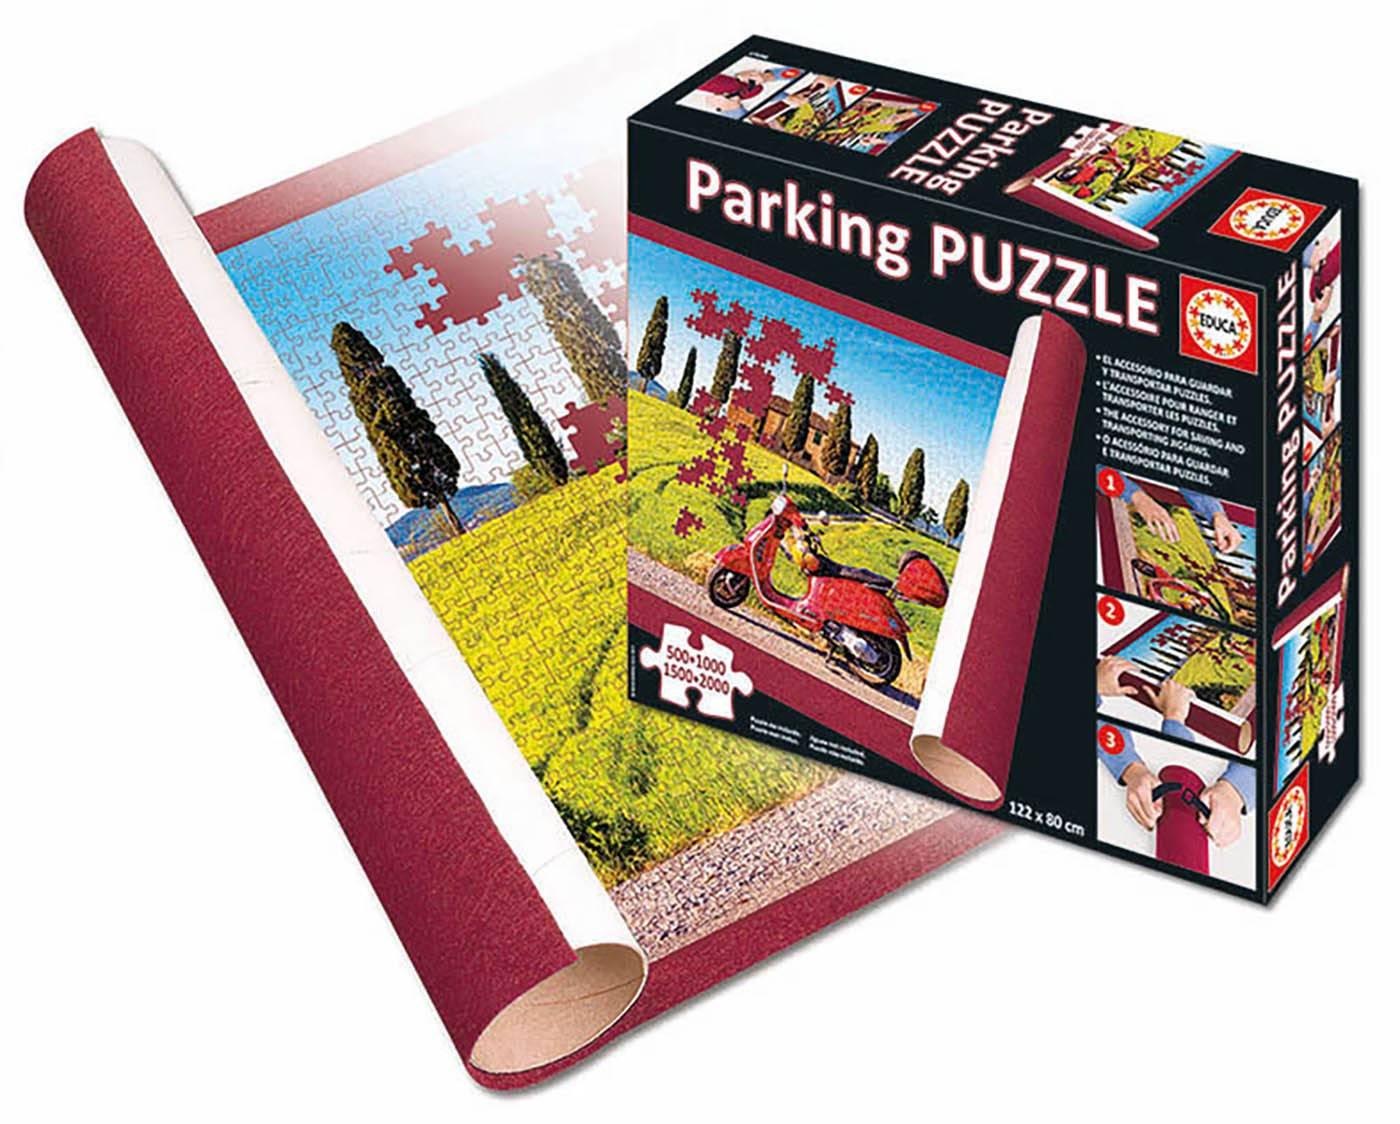 Puzzle - New educa® parking puzzle Puzzle 1 pièces--Educa